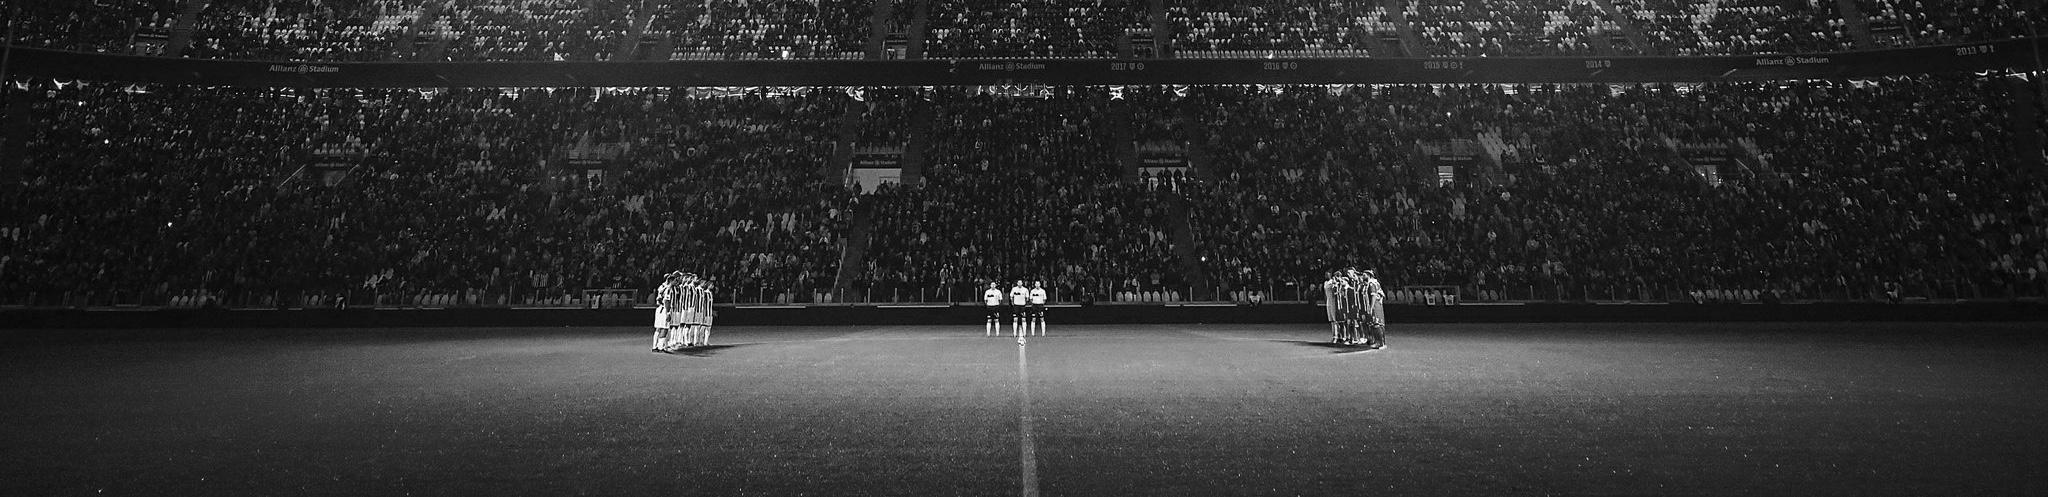 Anne Frank - Juventus Stadium bn